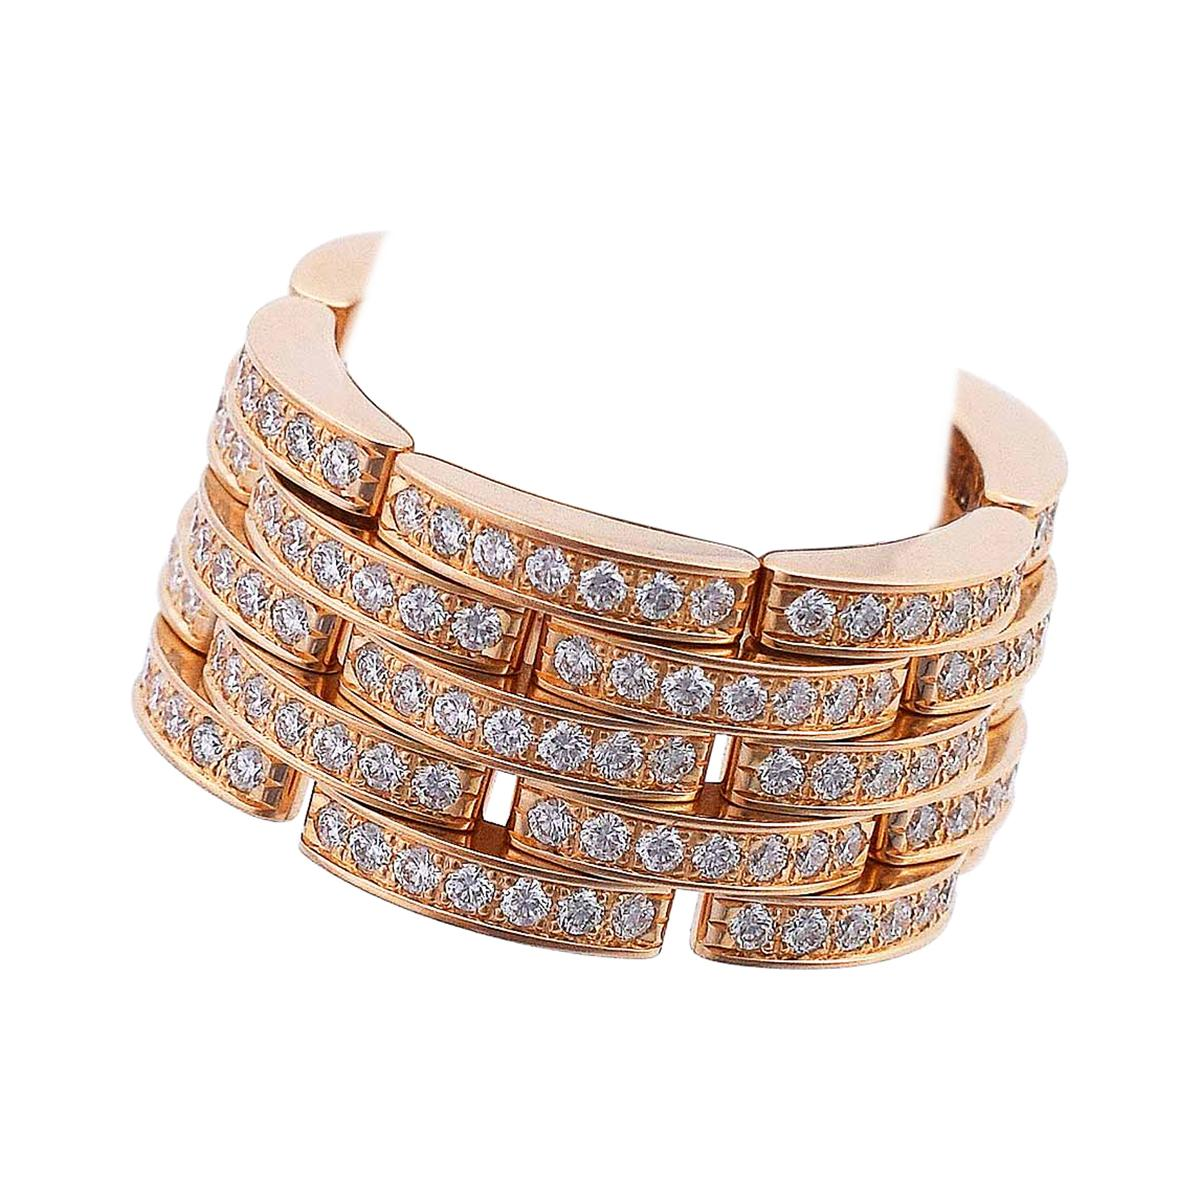 Cartier Diamond 18 Karat Pink Gold Maillon Panthere Ring